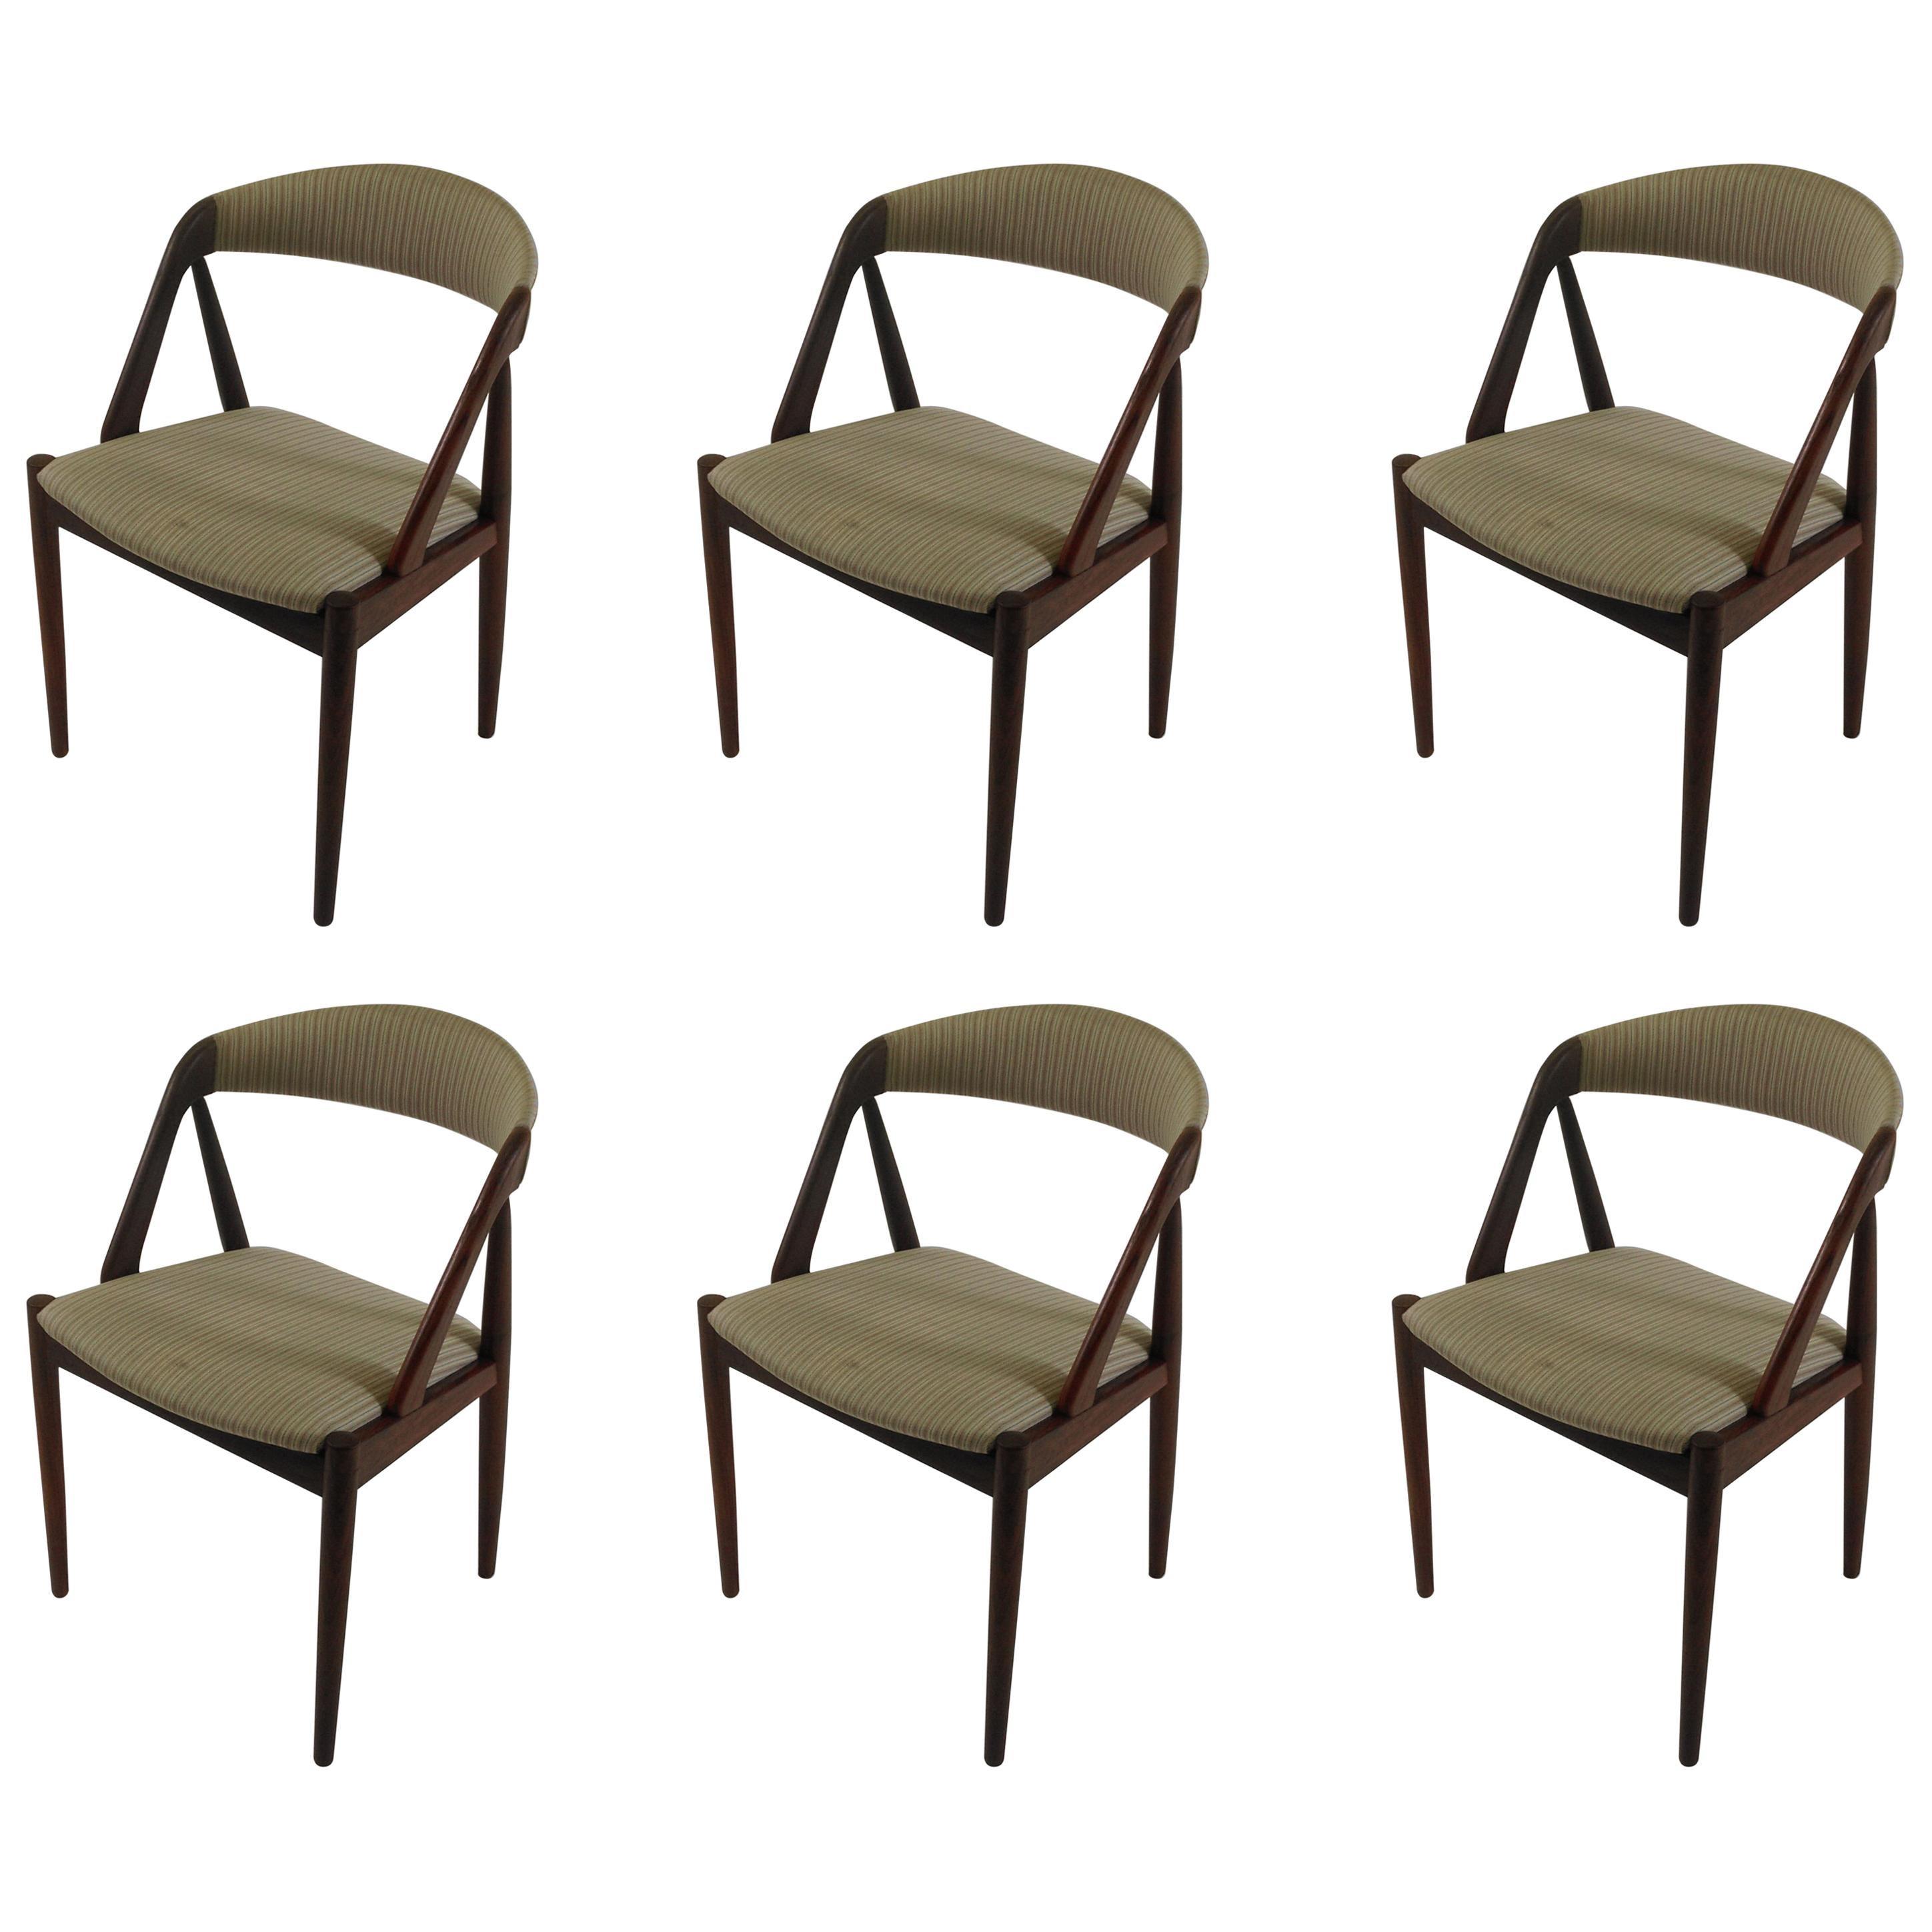 1960s Kai Kristiansen Set of Six Teak Dining Chairs - Choice of Upholstery